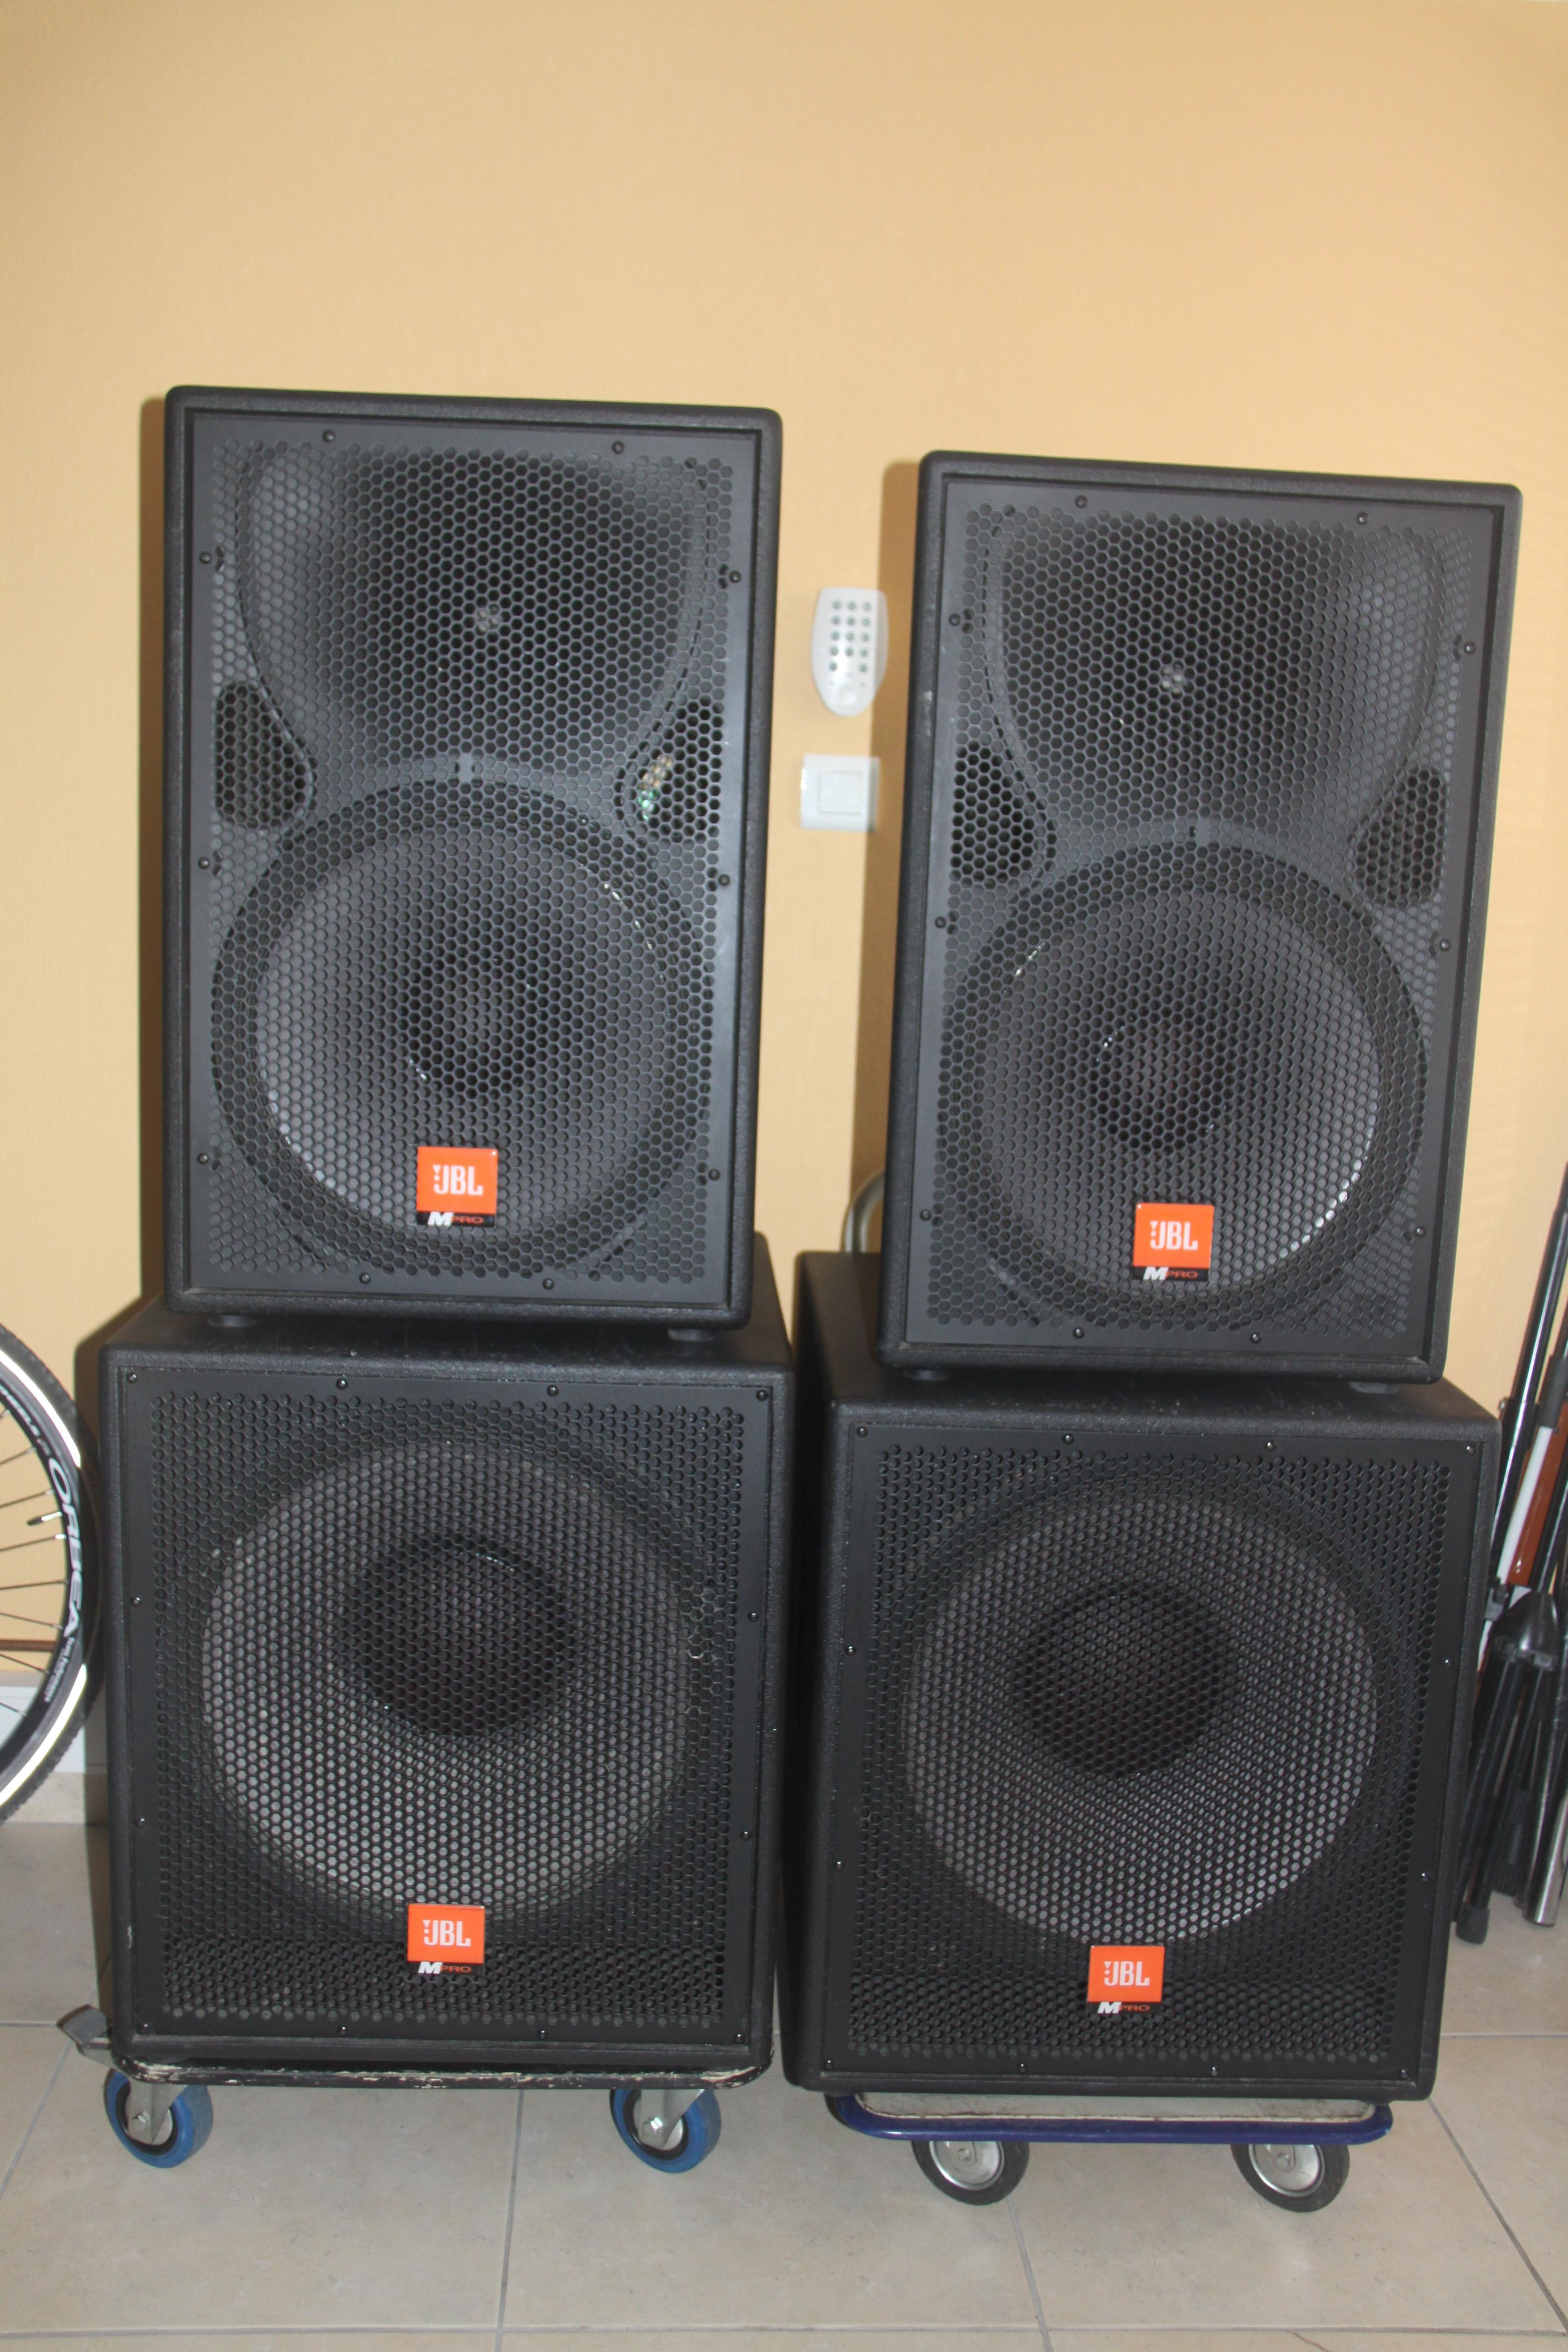 vends sono jbl 2000w champagne ardenne audiofanzine. Black Bedroom Furniture Sets. Home Design Ideas